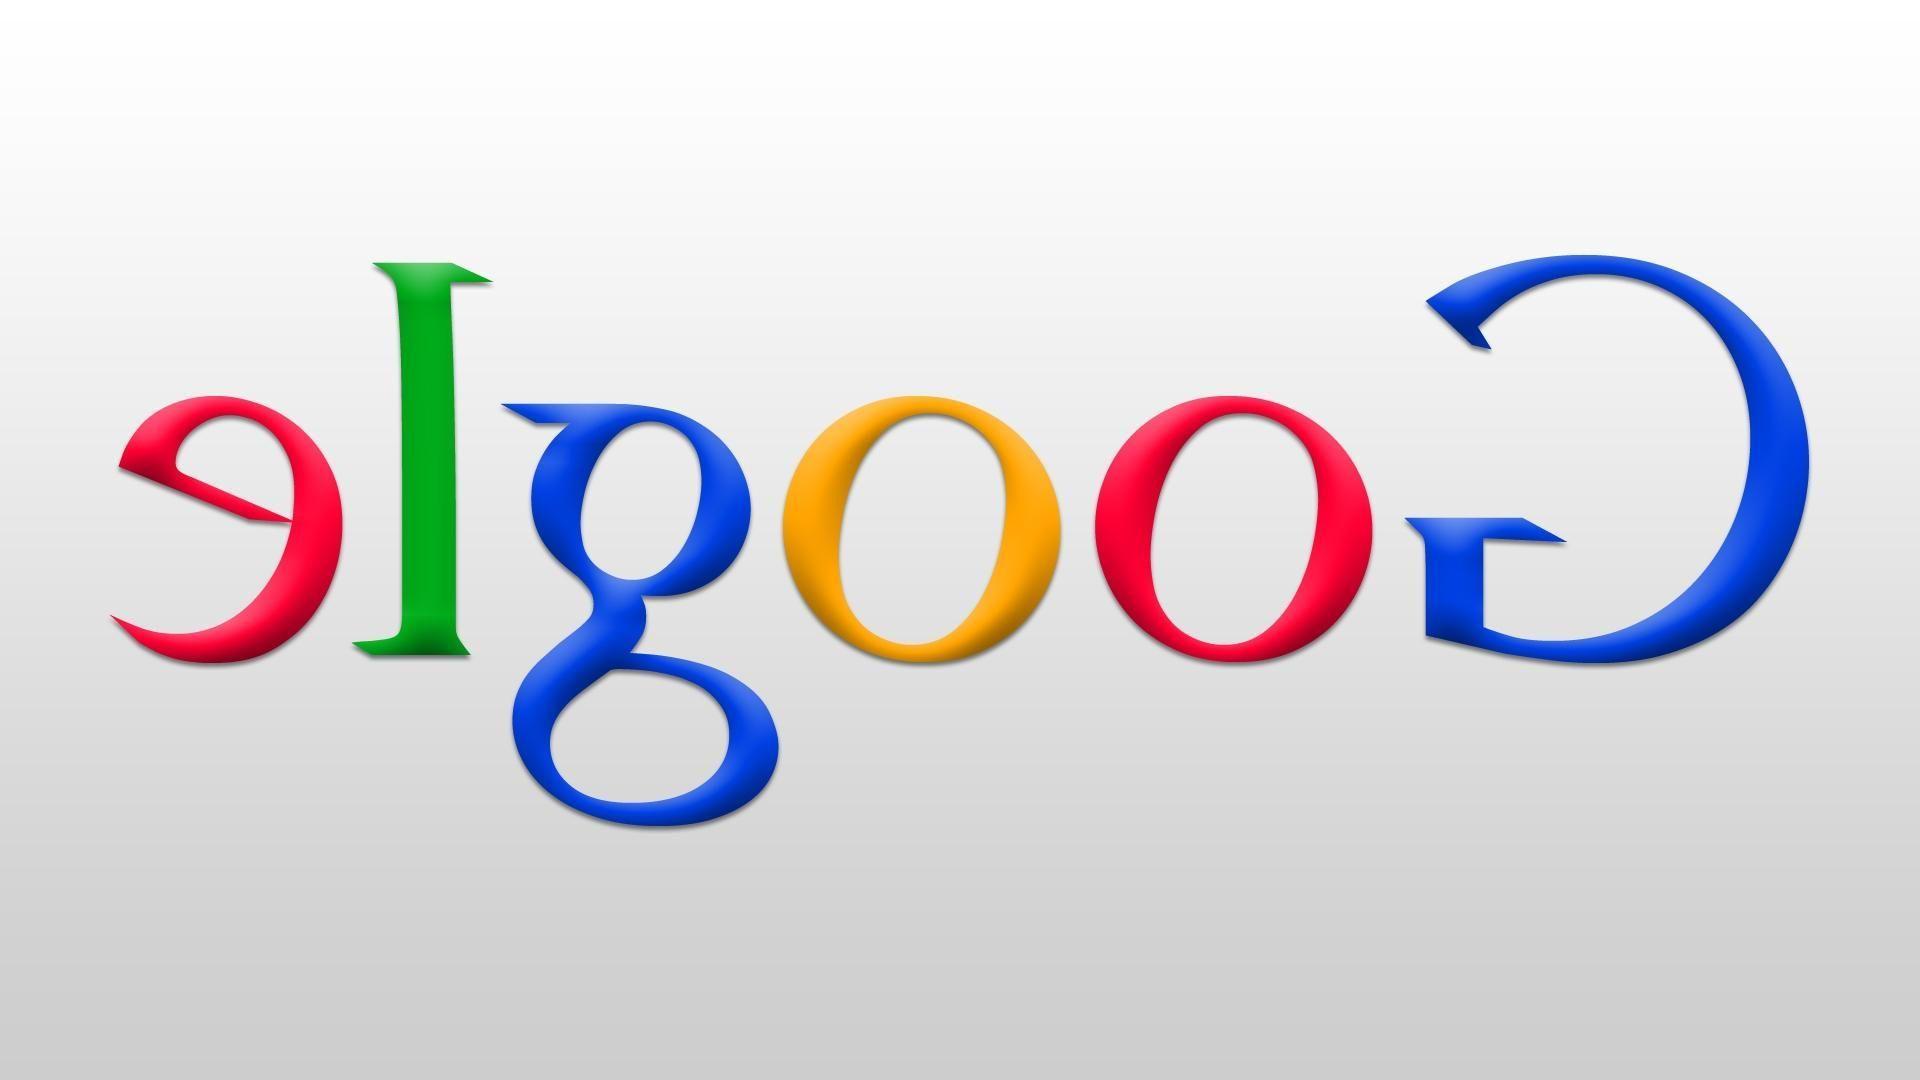 Google themes themebeta - Google Themes Themebeta 41